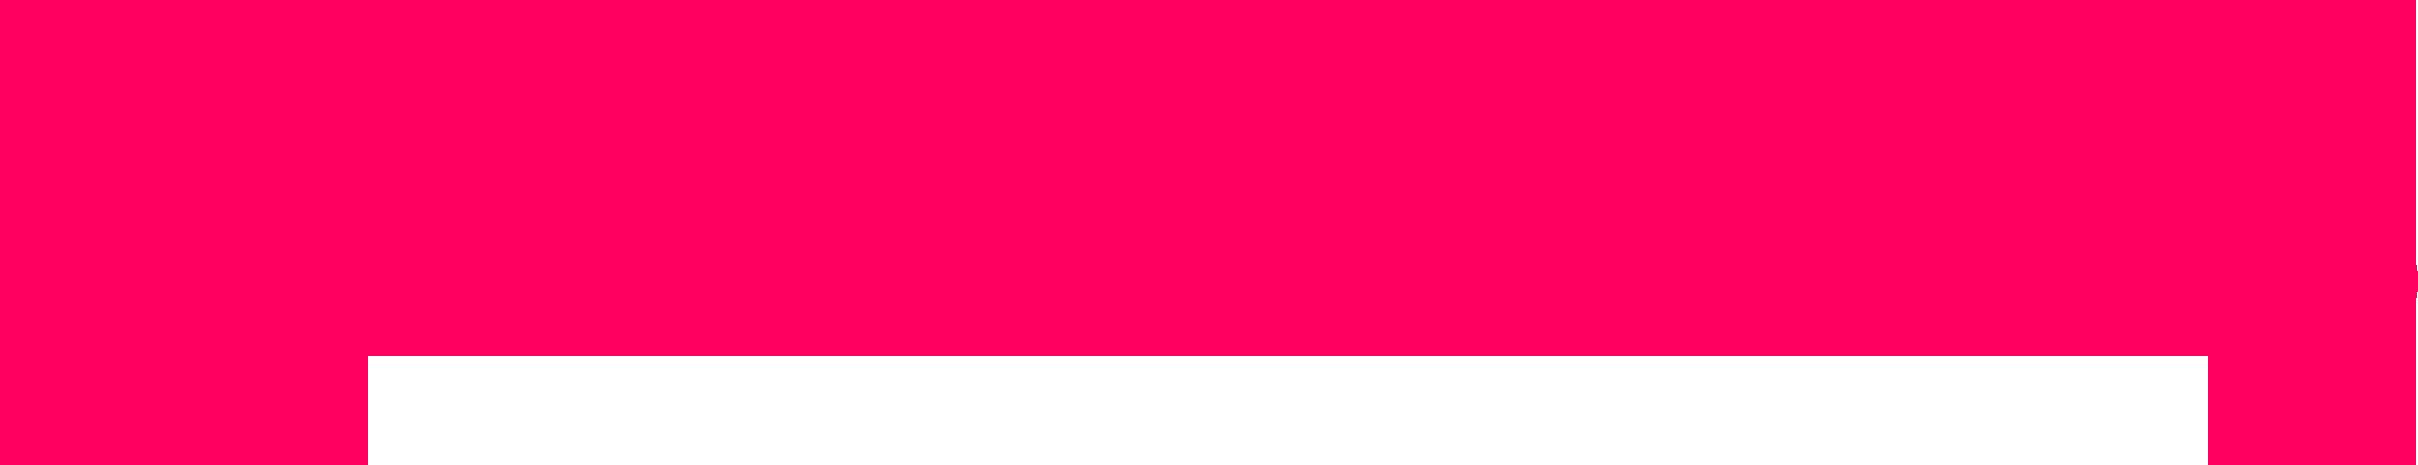 anytimes_logo